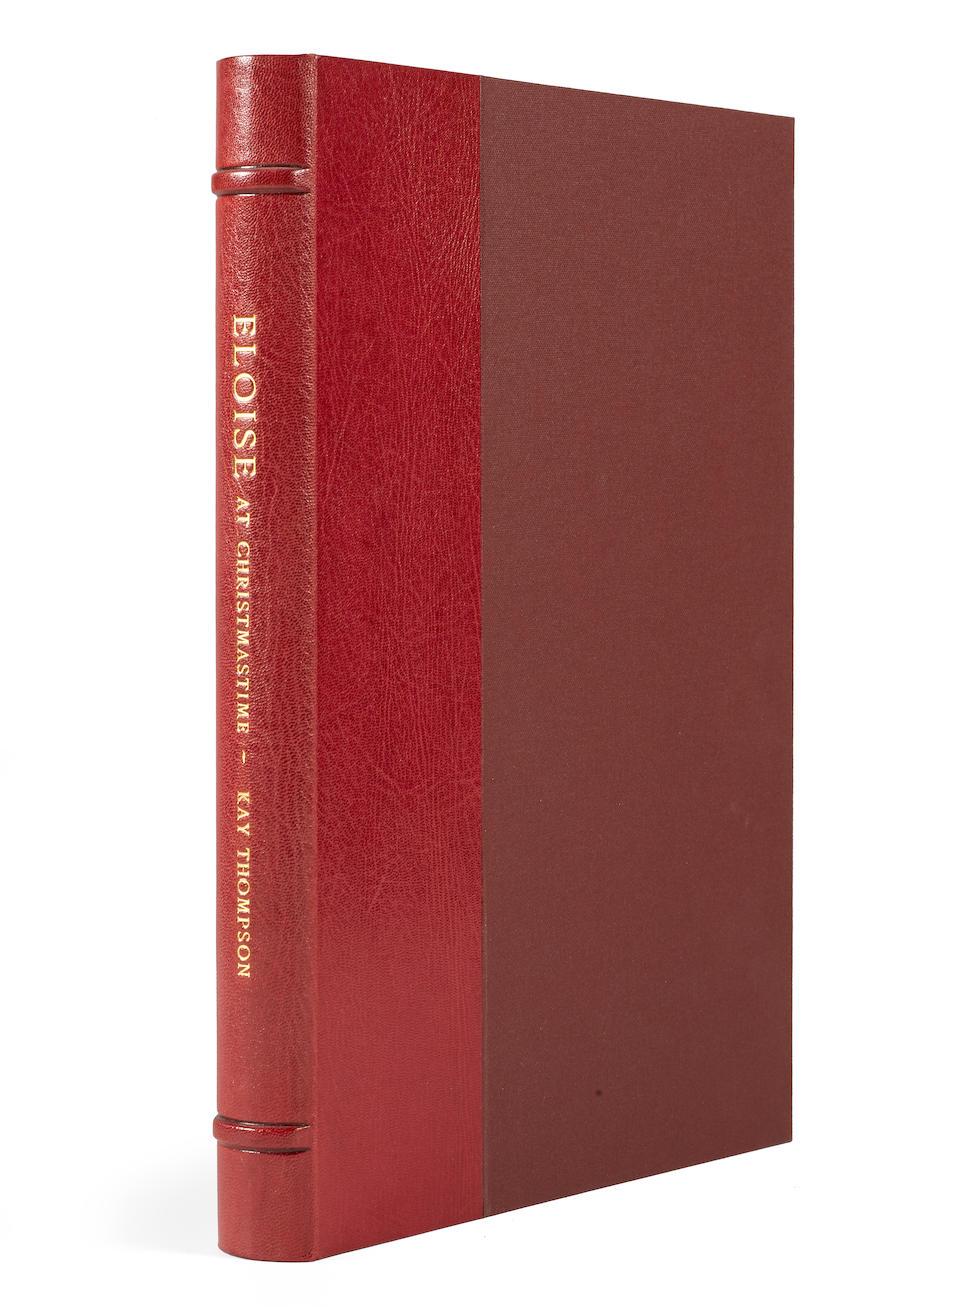 THOMPSON, KAY. 1909-1998. KNIGHT, HILARY. B. 1926. Illustrator. Eloise at Christmastime. New York: Random House, 1958.